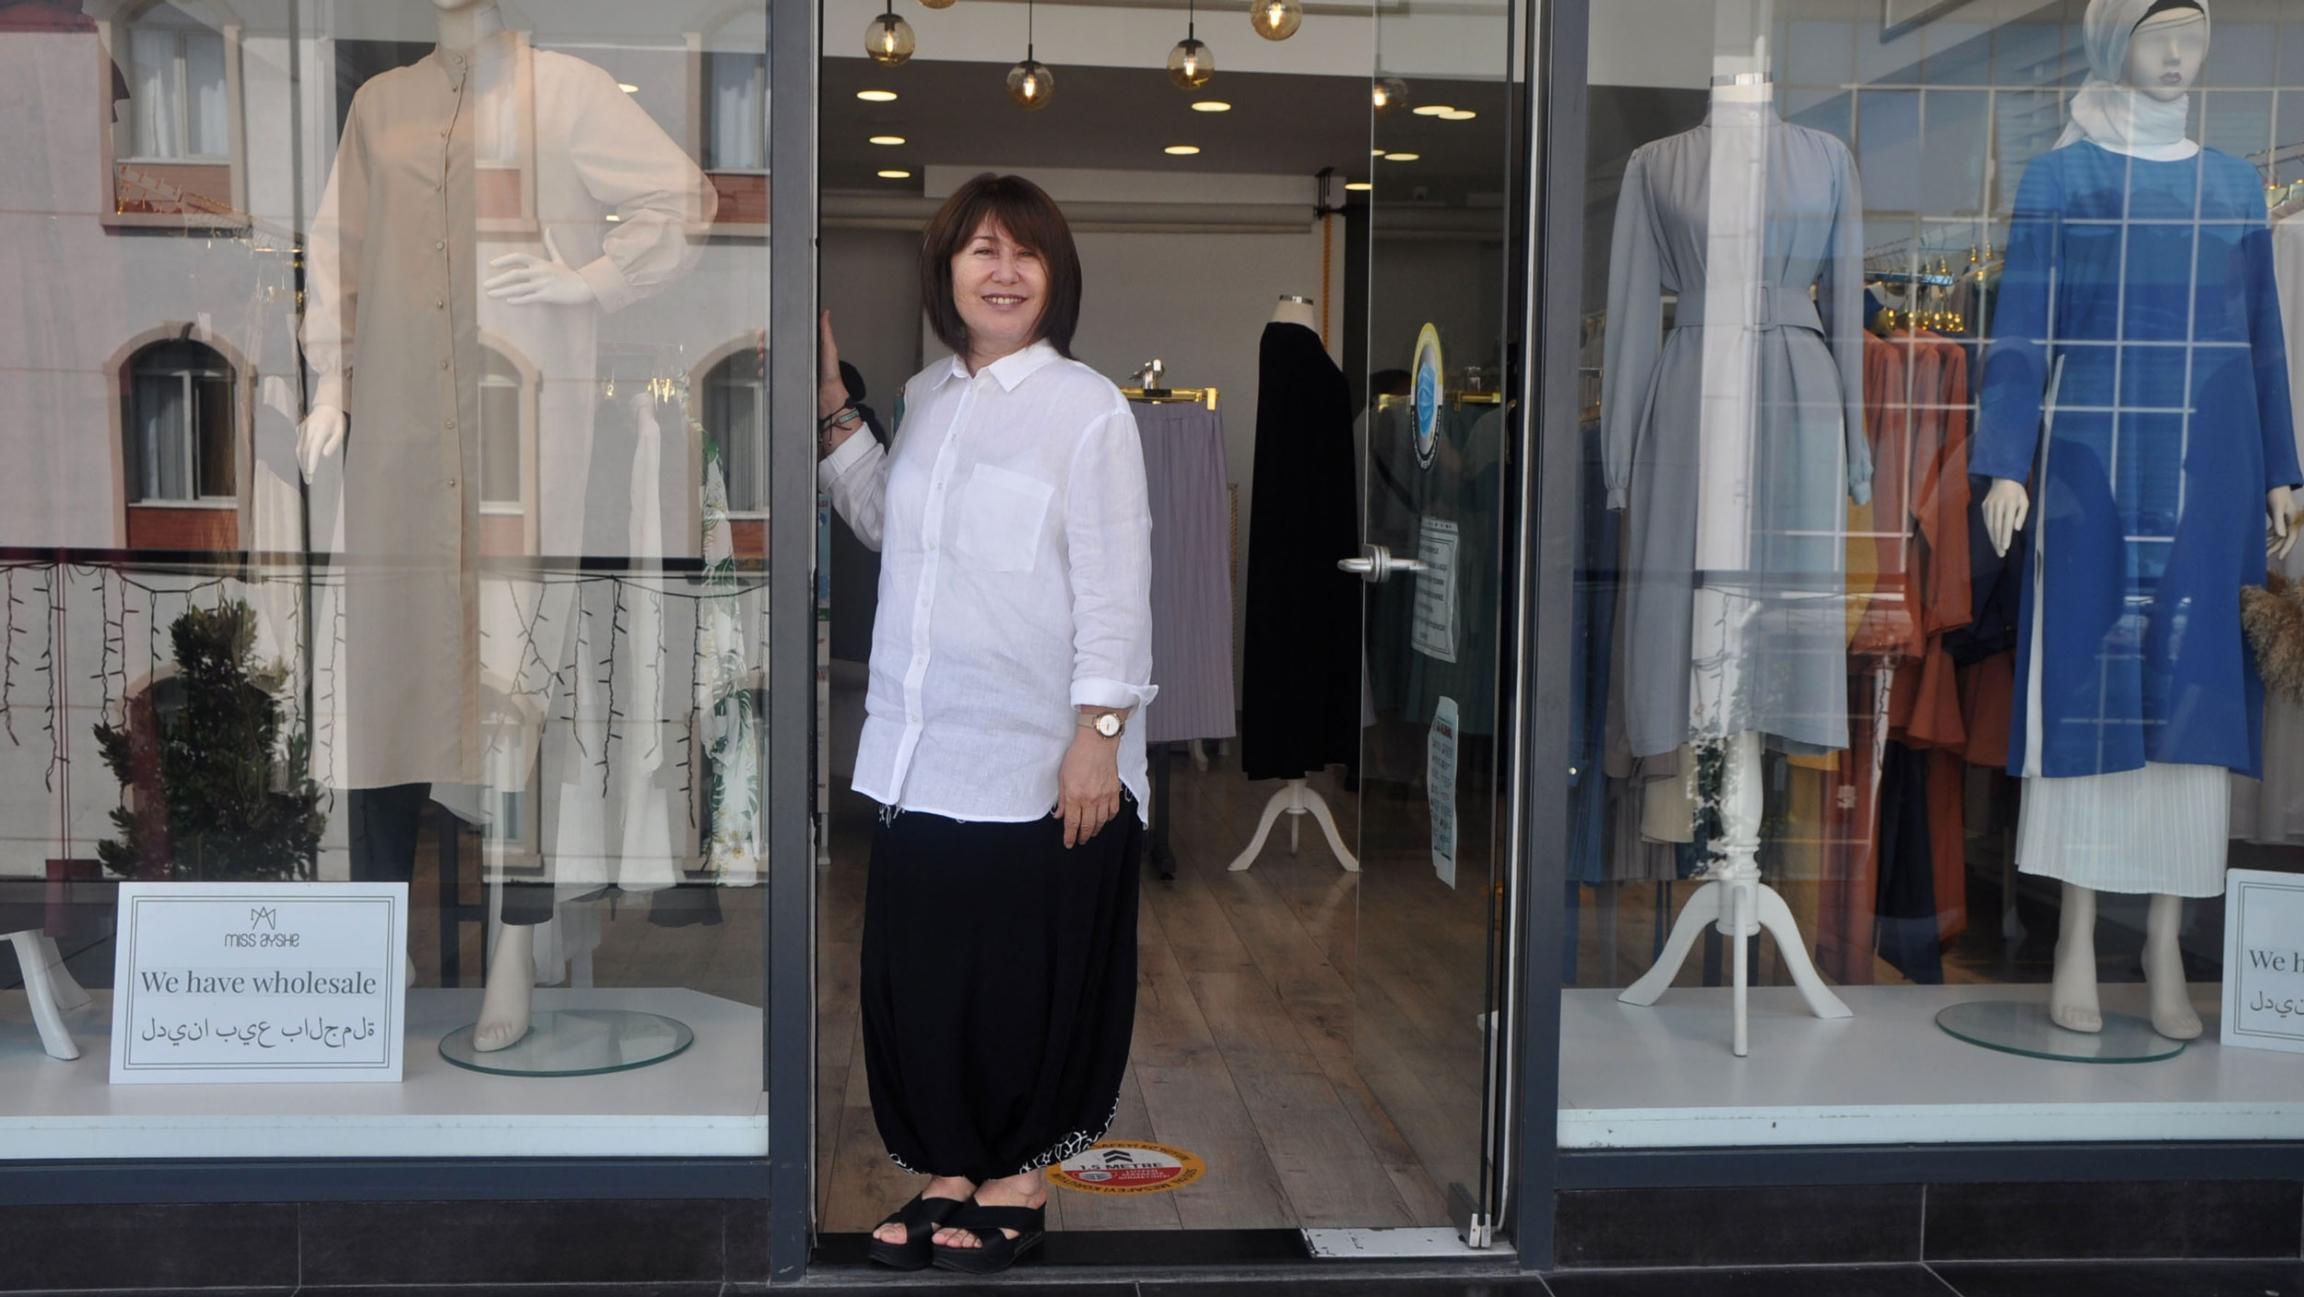 Ayşe Yıldırım started her modest fashion brand, Miss Ayşe, over a decade ago.